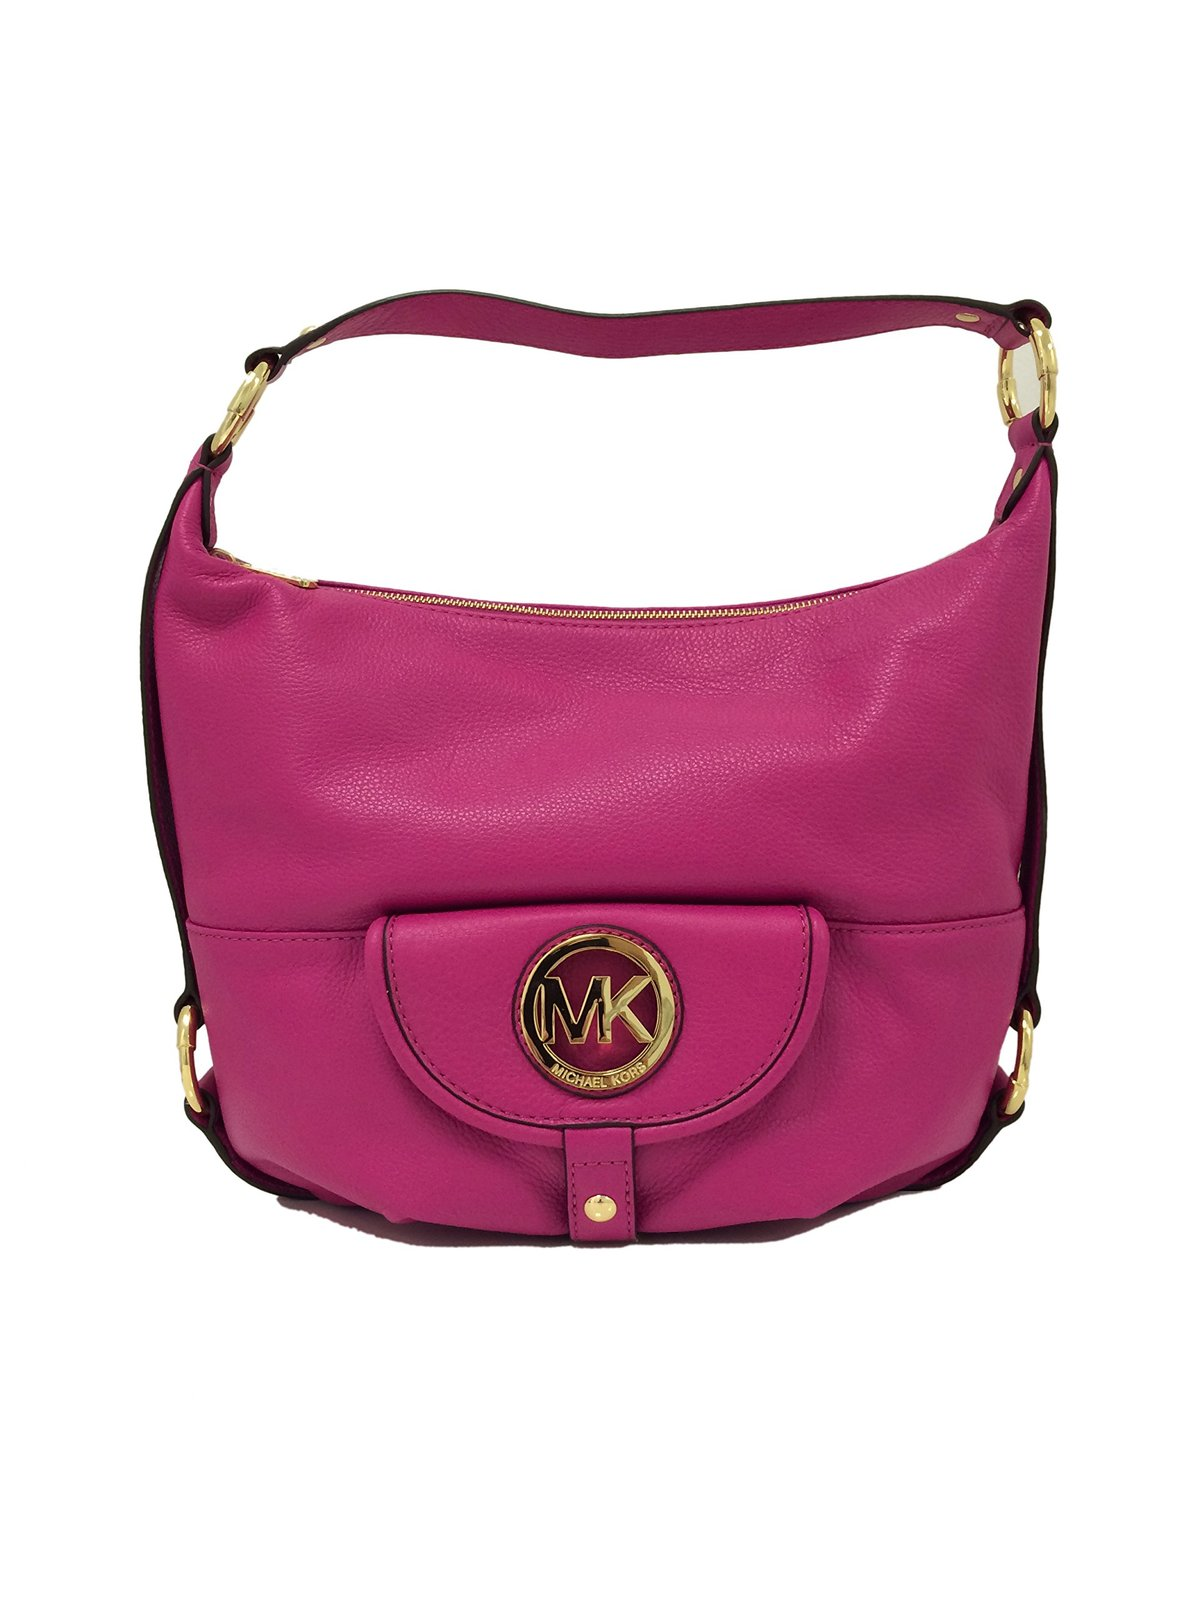 fbe5945ce4846a 81sbj6ohkzl. 81sbj6ohkzl. Previous. Michael Kors Fulton Large Fuschia Pink  Leather Shoulder Bag · Michael ...